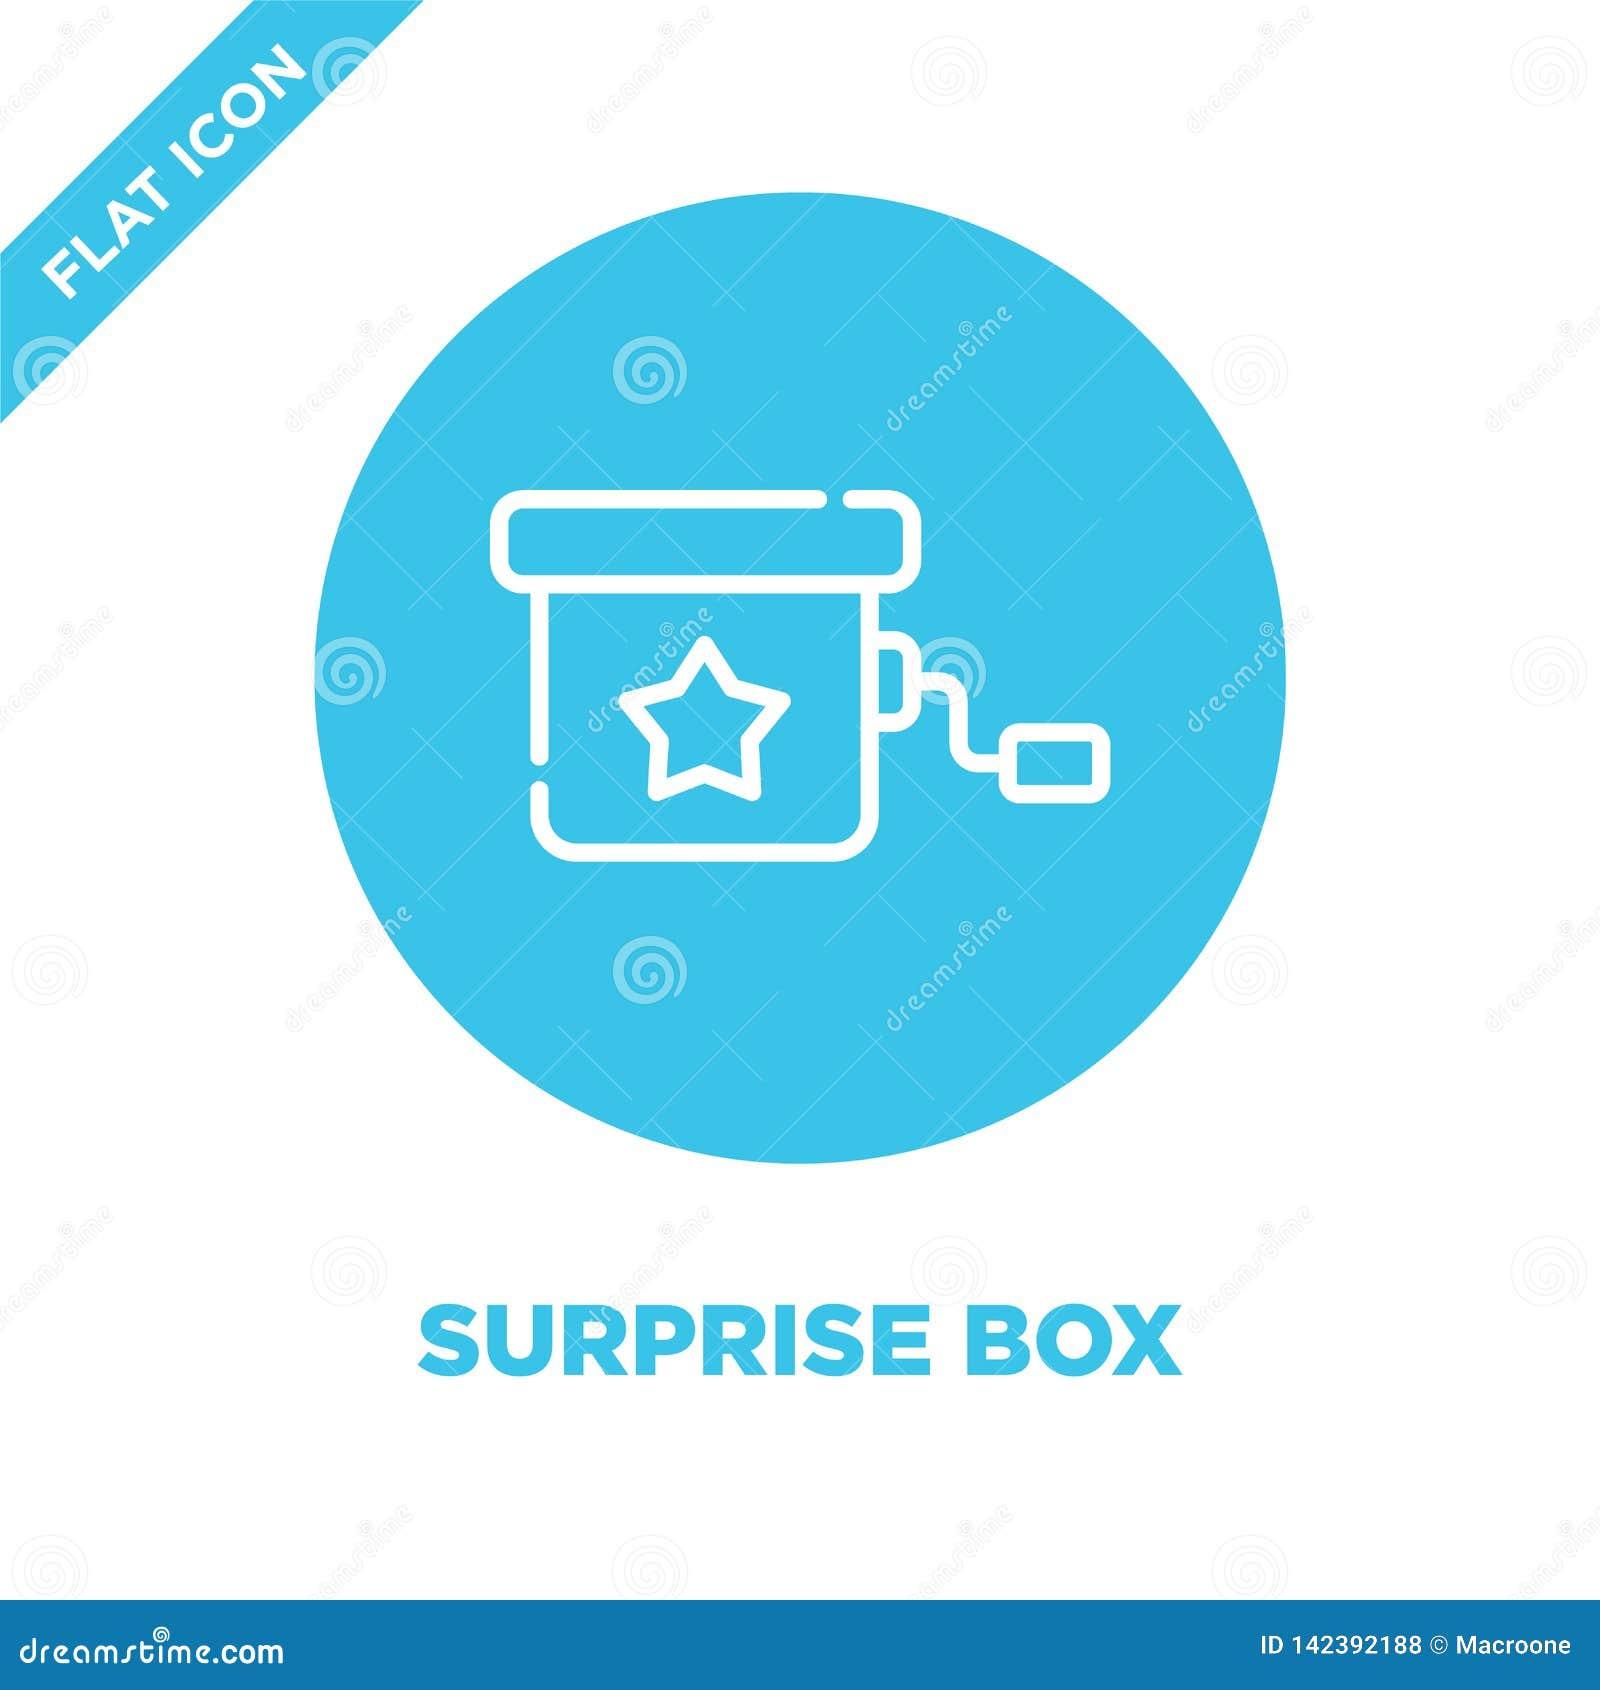 вектор значка коробки сюрприза от собрания игрушек младенца Тонкая линия иллюстрация вектора значка плана коробки сюрприза Линейн